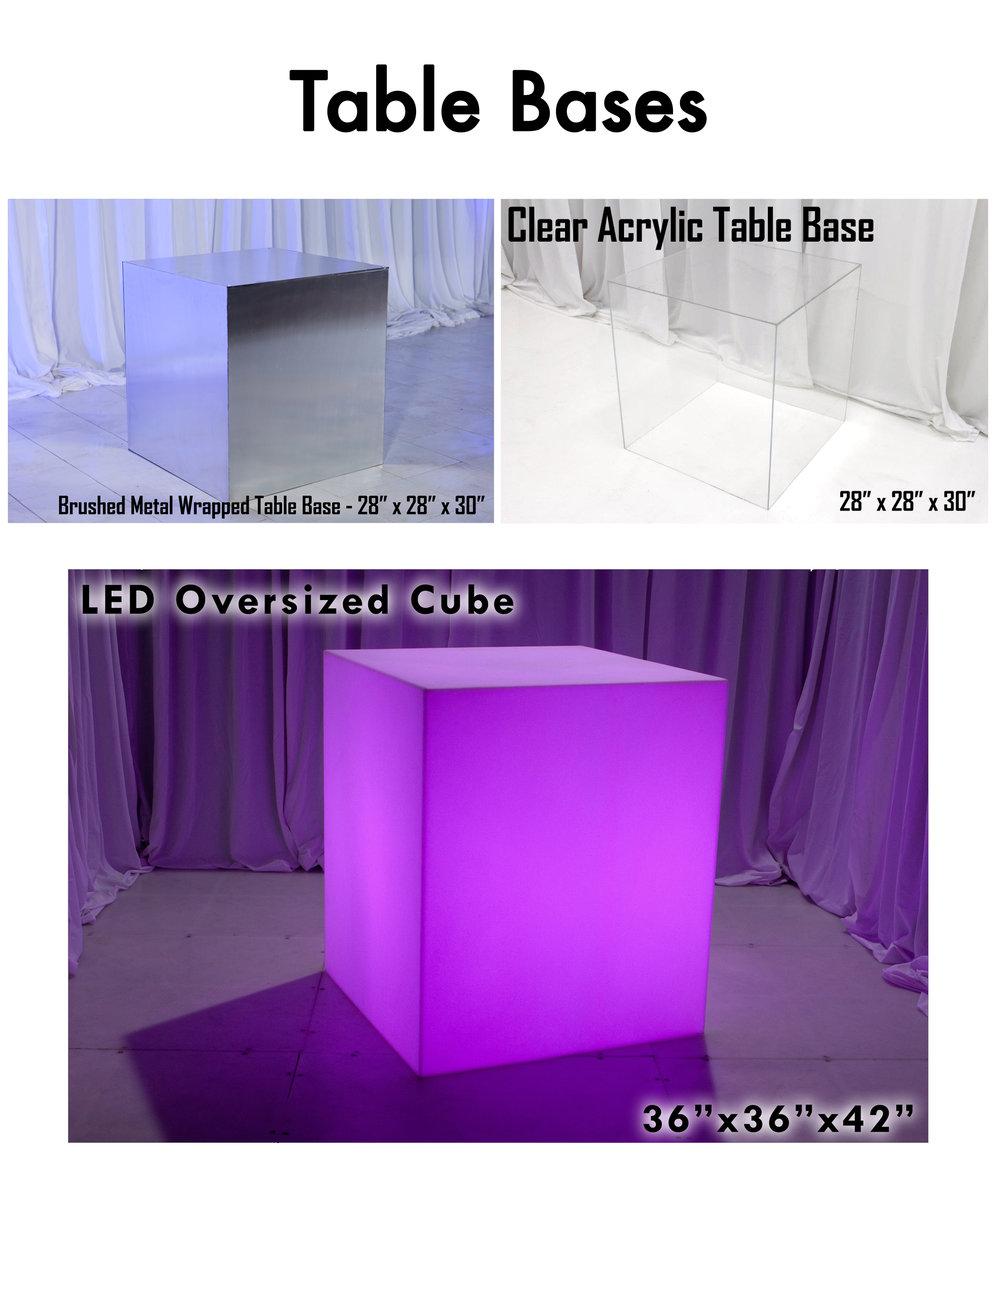 061-061-P60_Table Bases.jpg